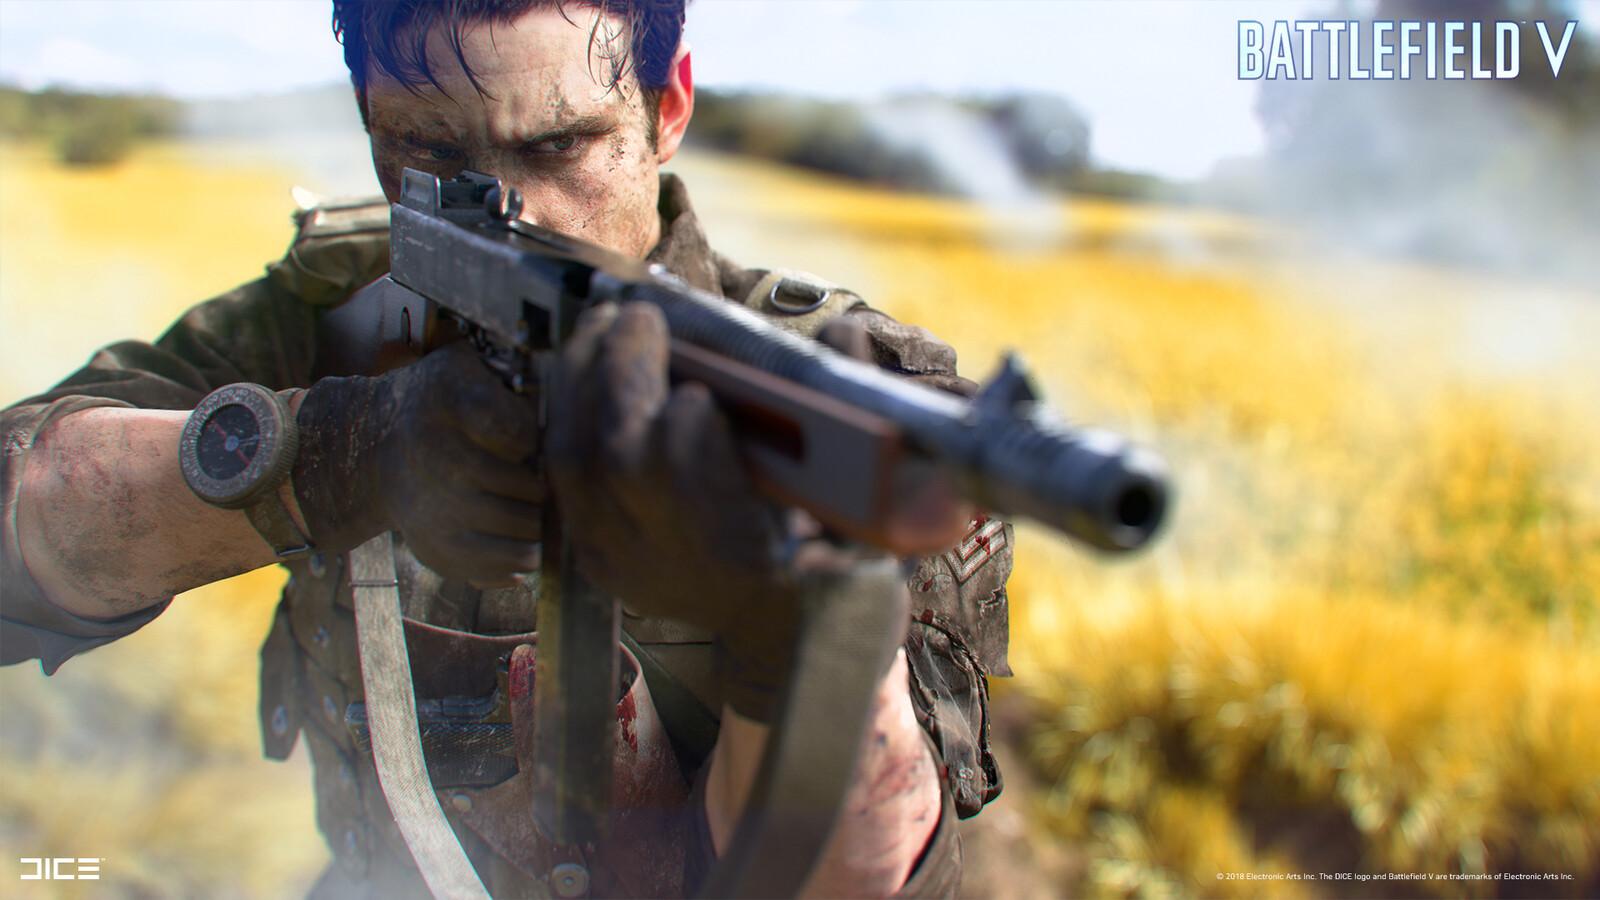 """Battlefield V"" - Allied Assault in Arras, France - Visual target concept"